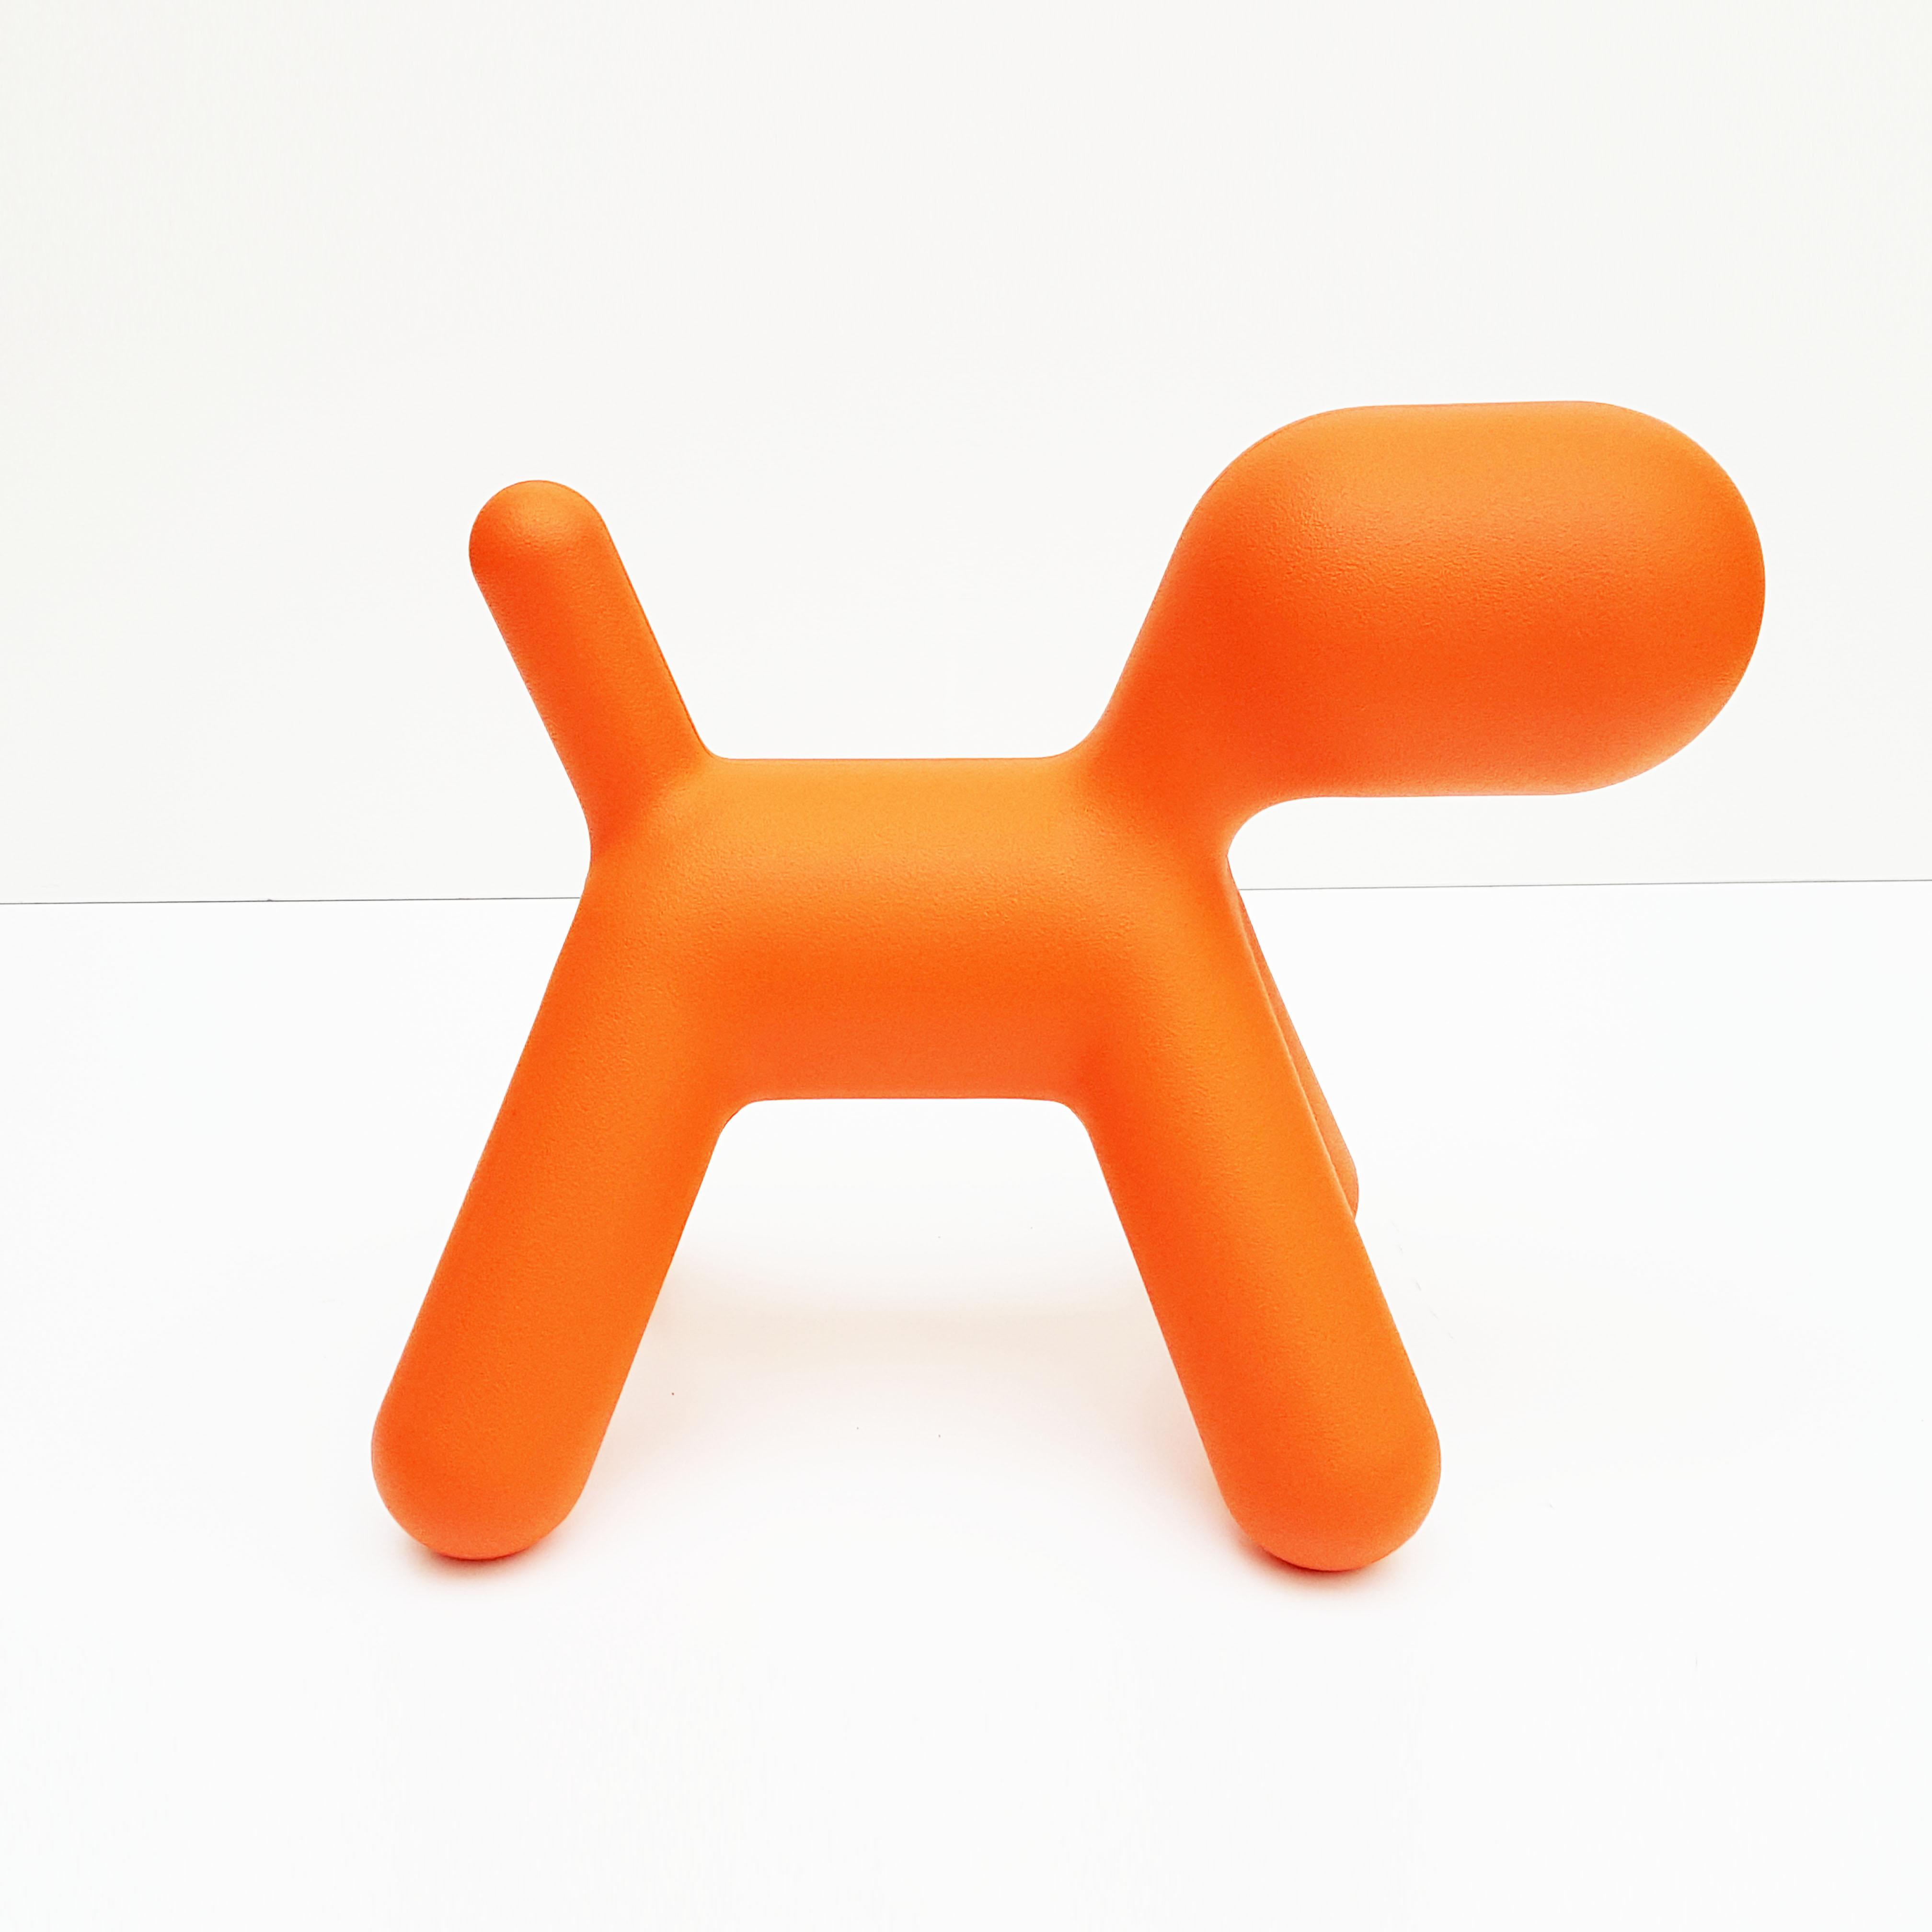 hippe oranje kinderstoel puppy van magis by eero aarnio bureau baantjer. Black Bedroom Furniture Sets. Home Design Ideas